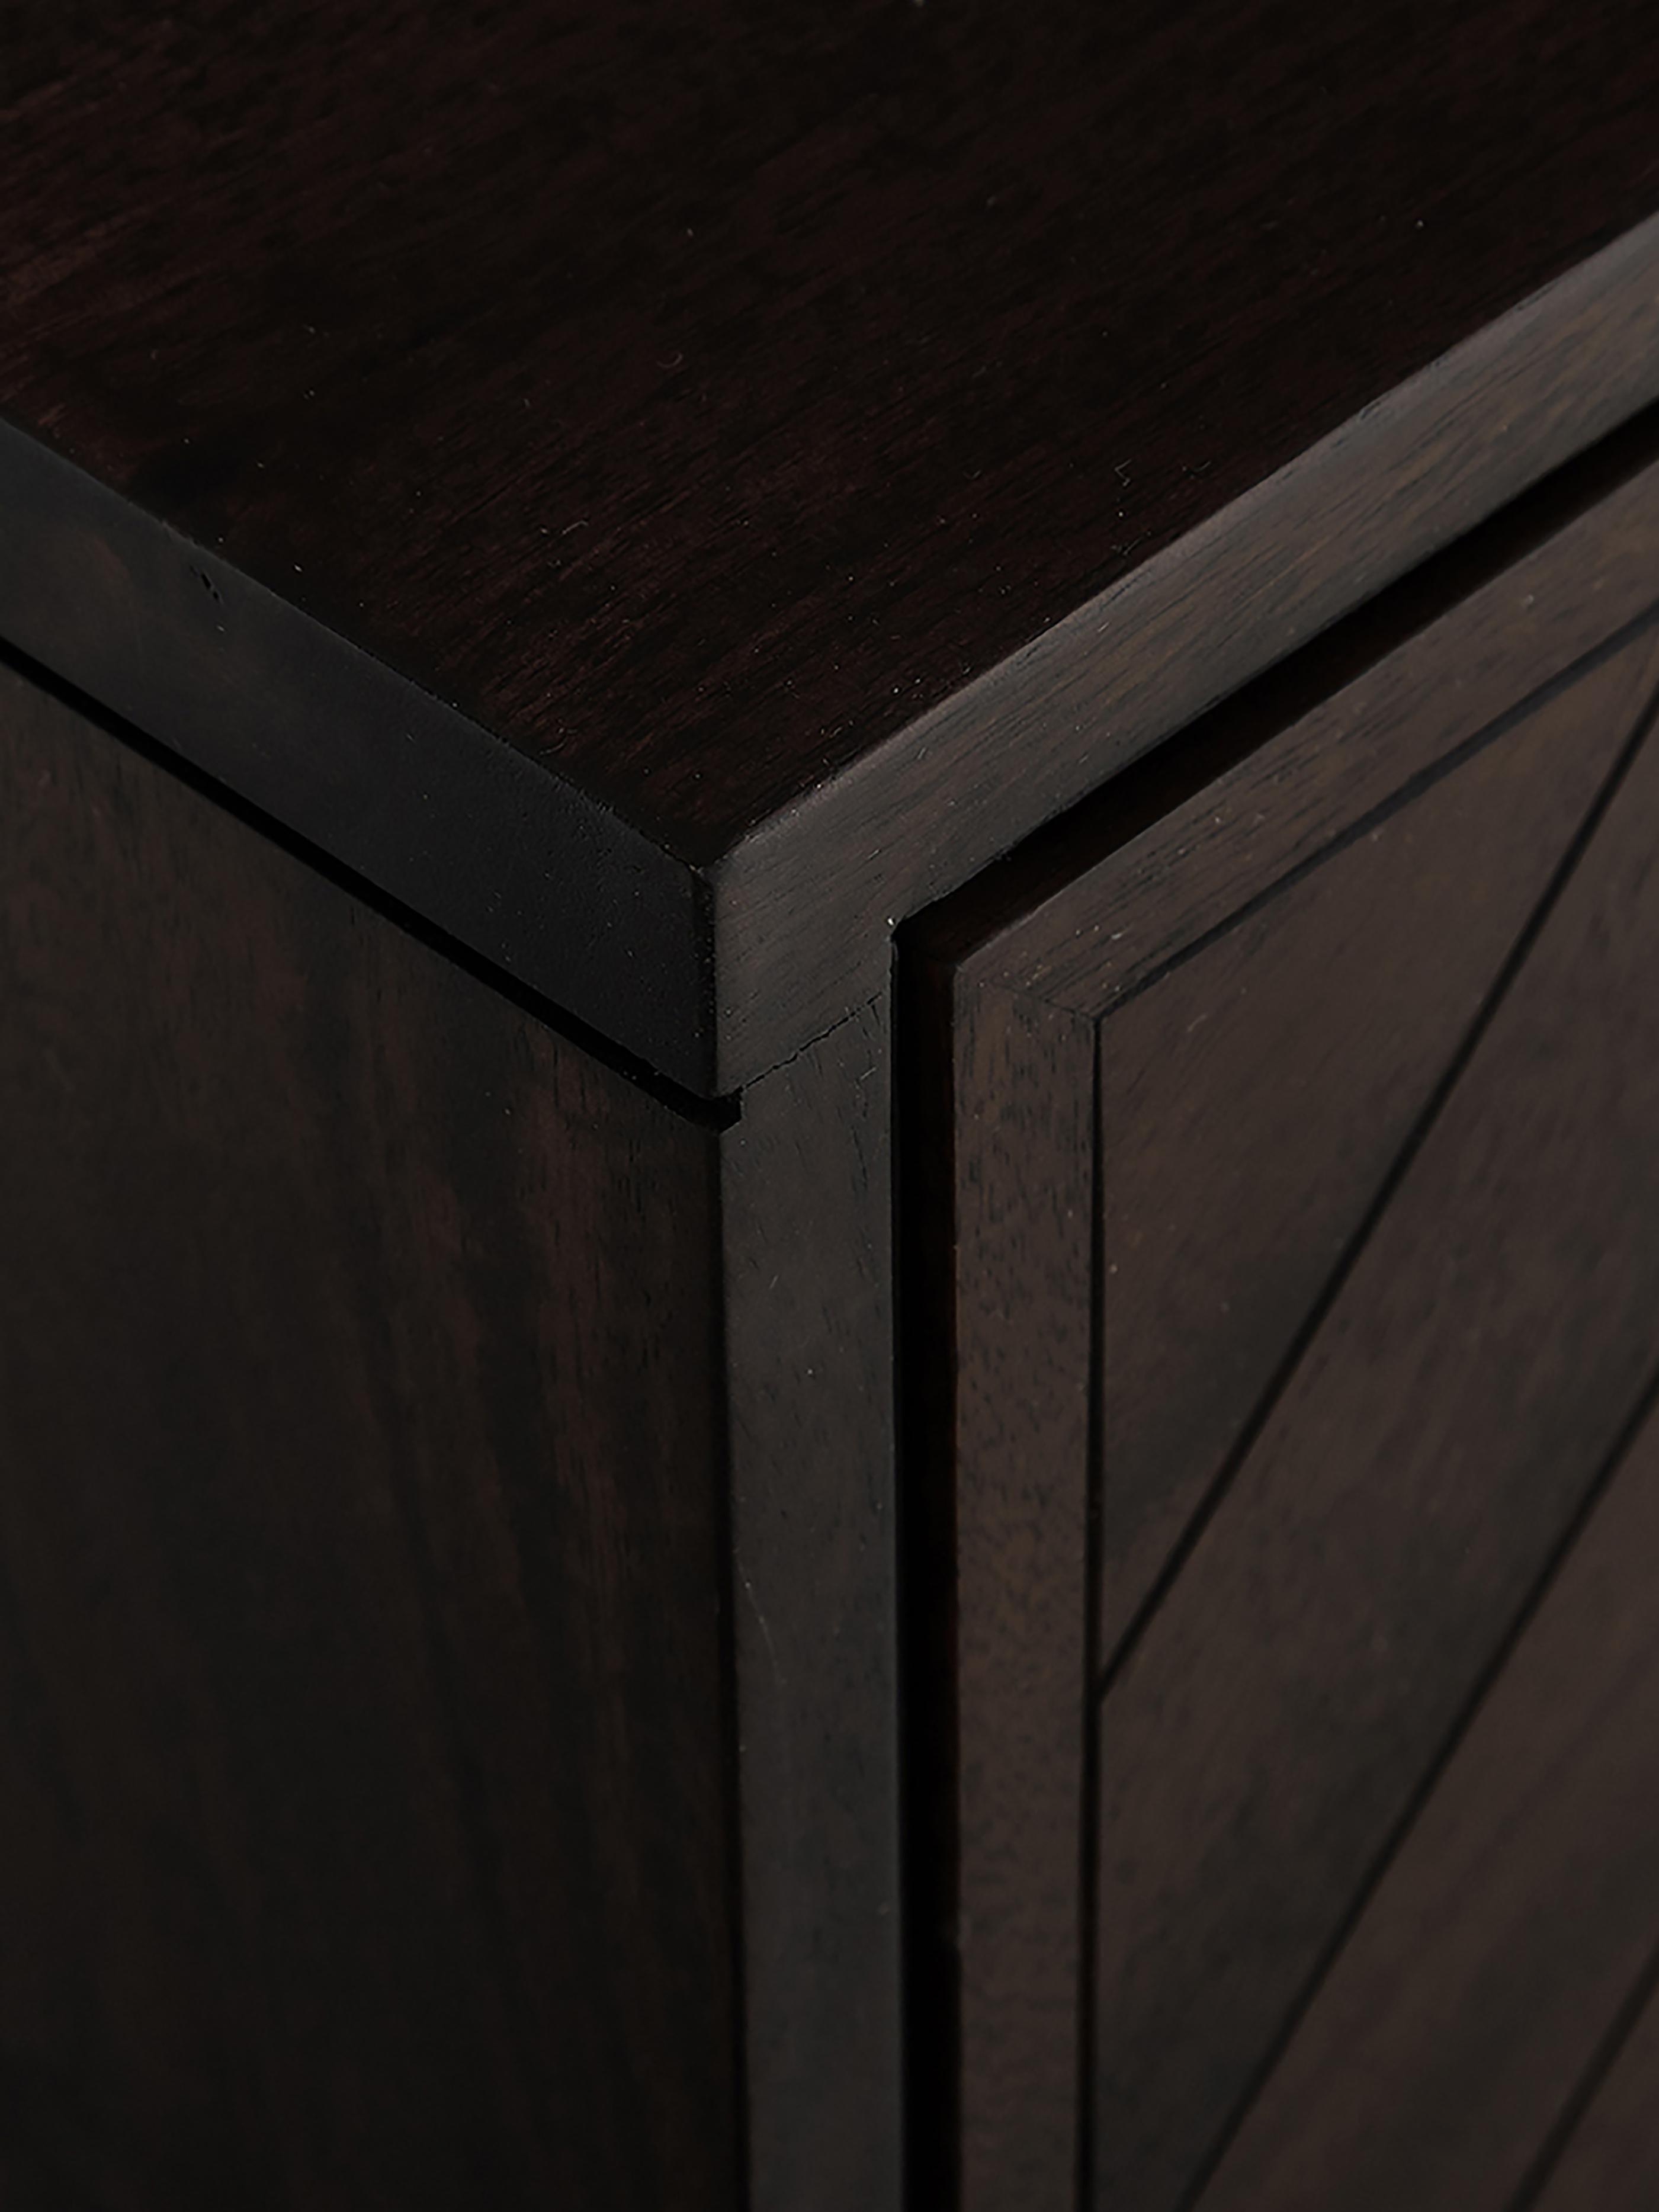 Visgraat dressoir Luca, Frame: gecoat metaal, Donkerbruin, 160 x 70 cm